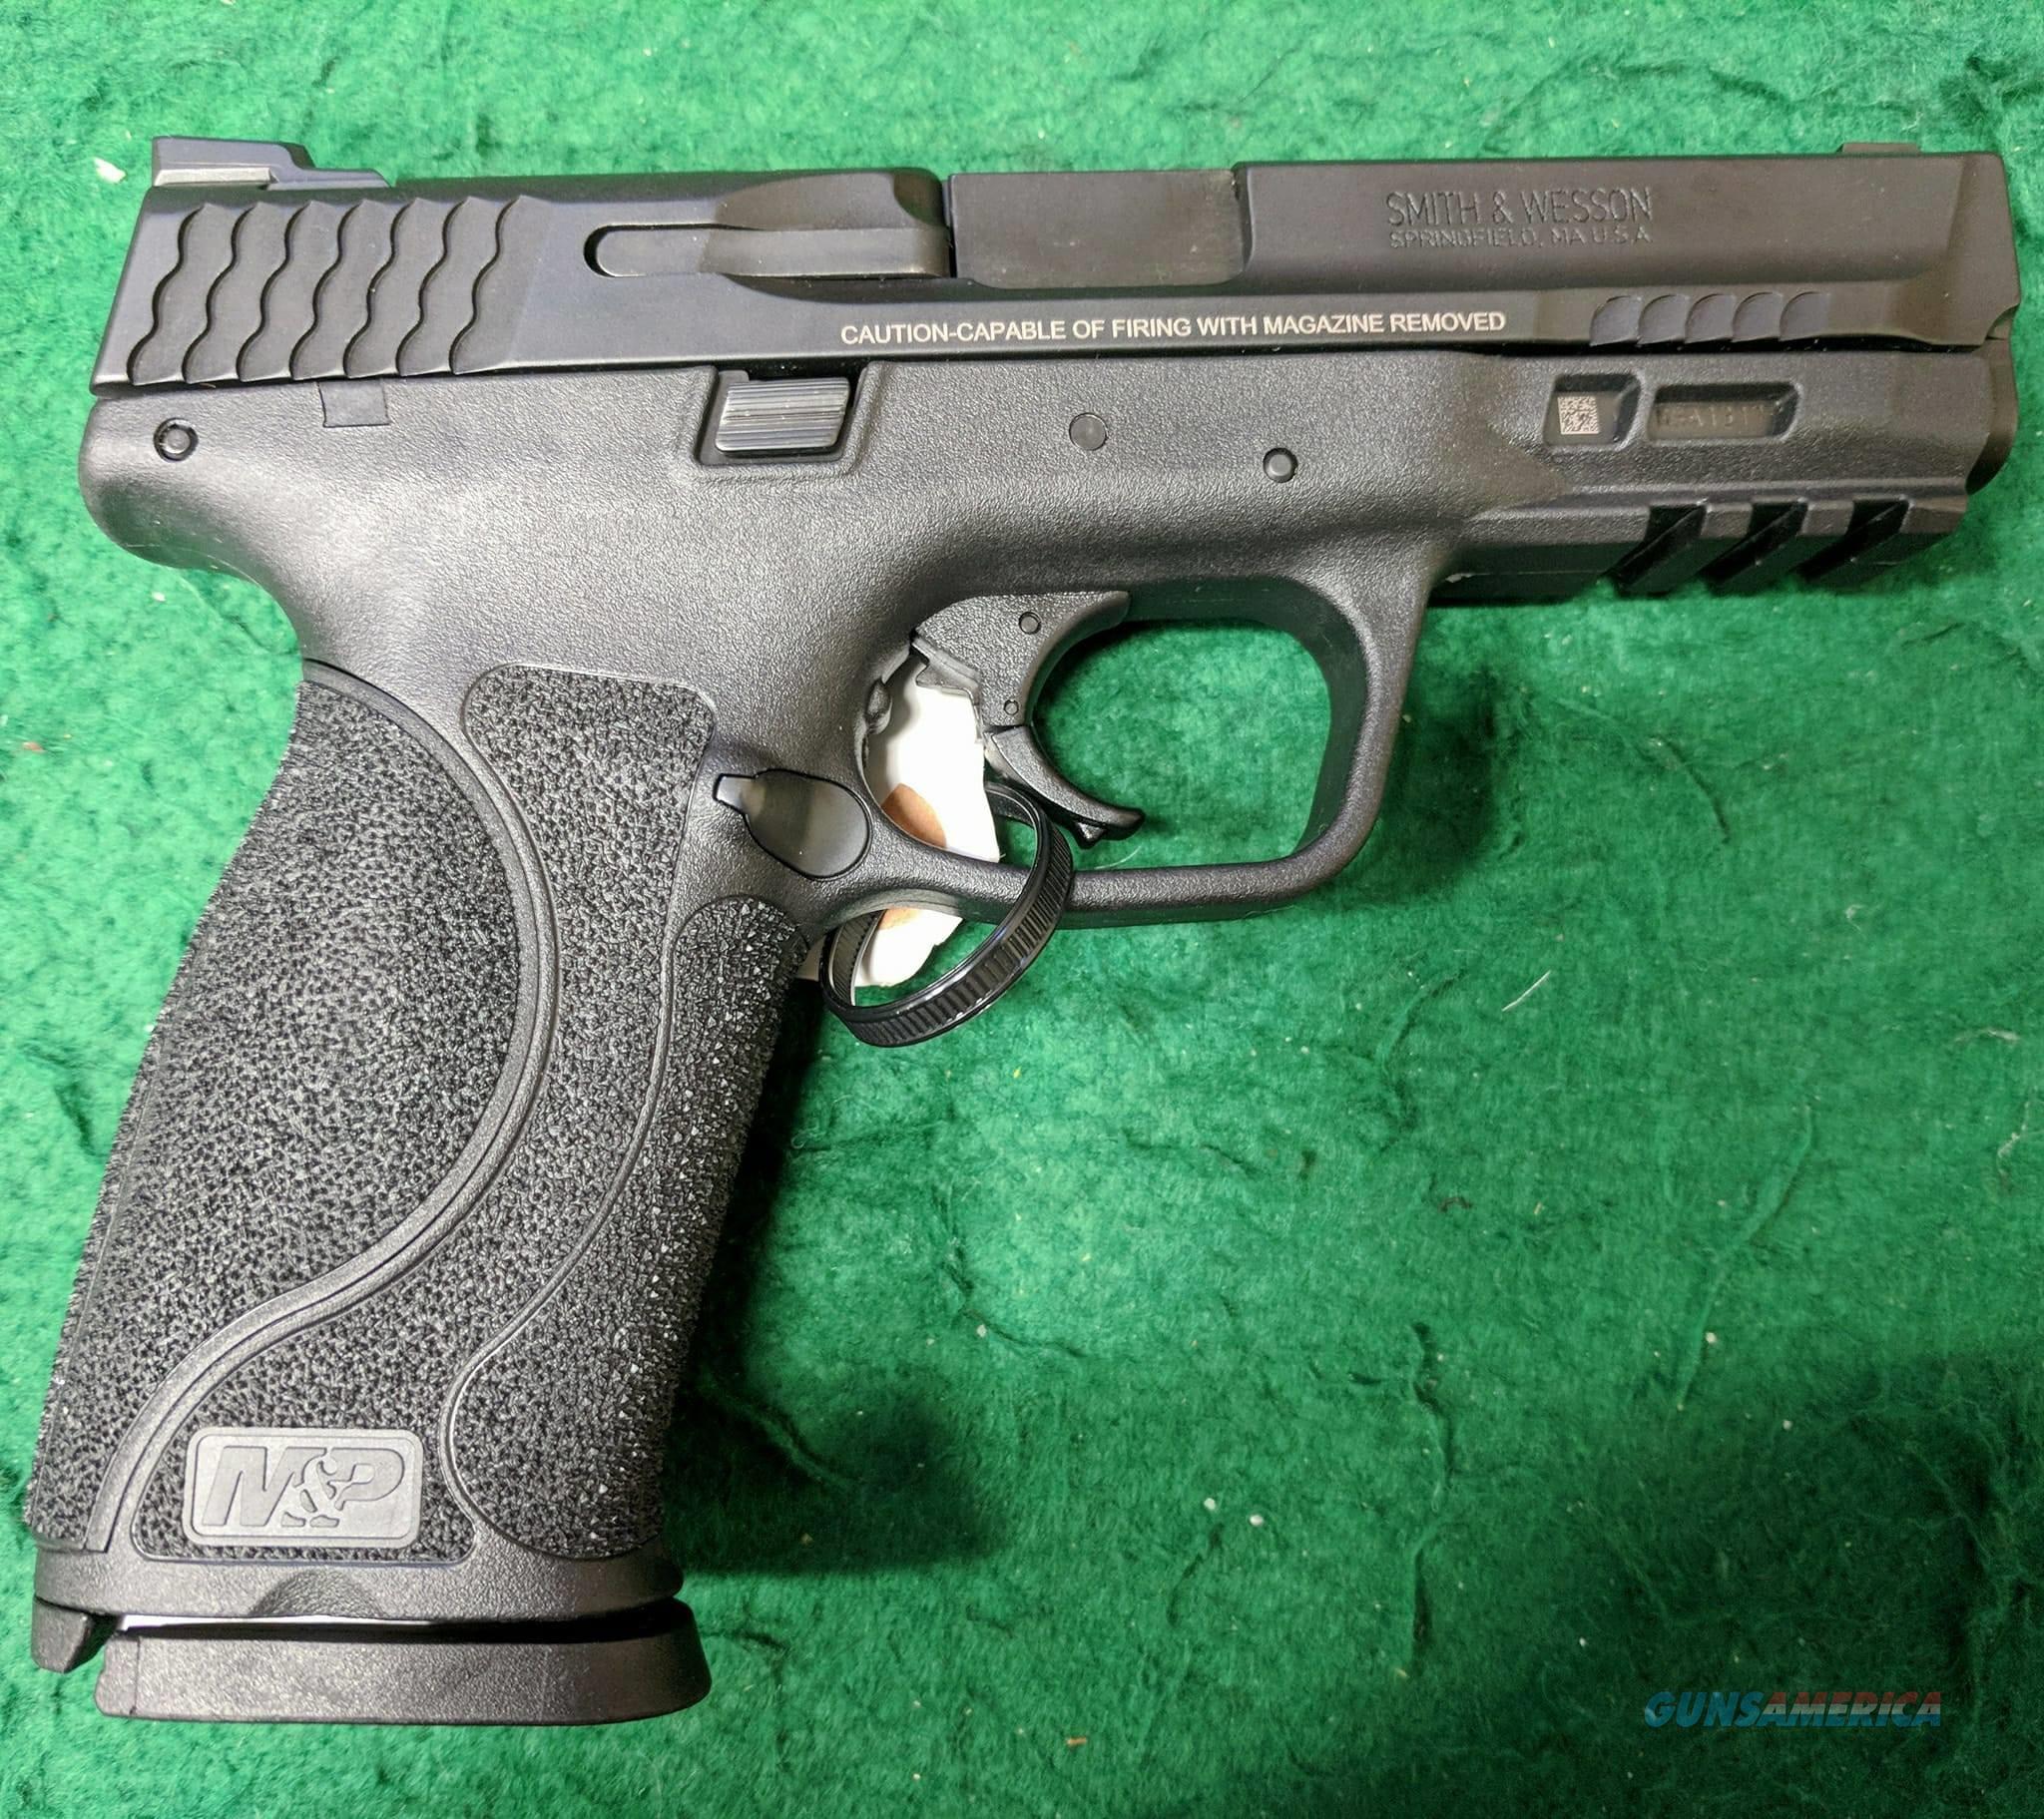 S&W - M&P - 2.0 - 9mm   Guns > Pistols > Smith & Wesson Pistols - Autos > Polymer Frame